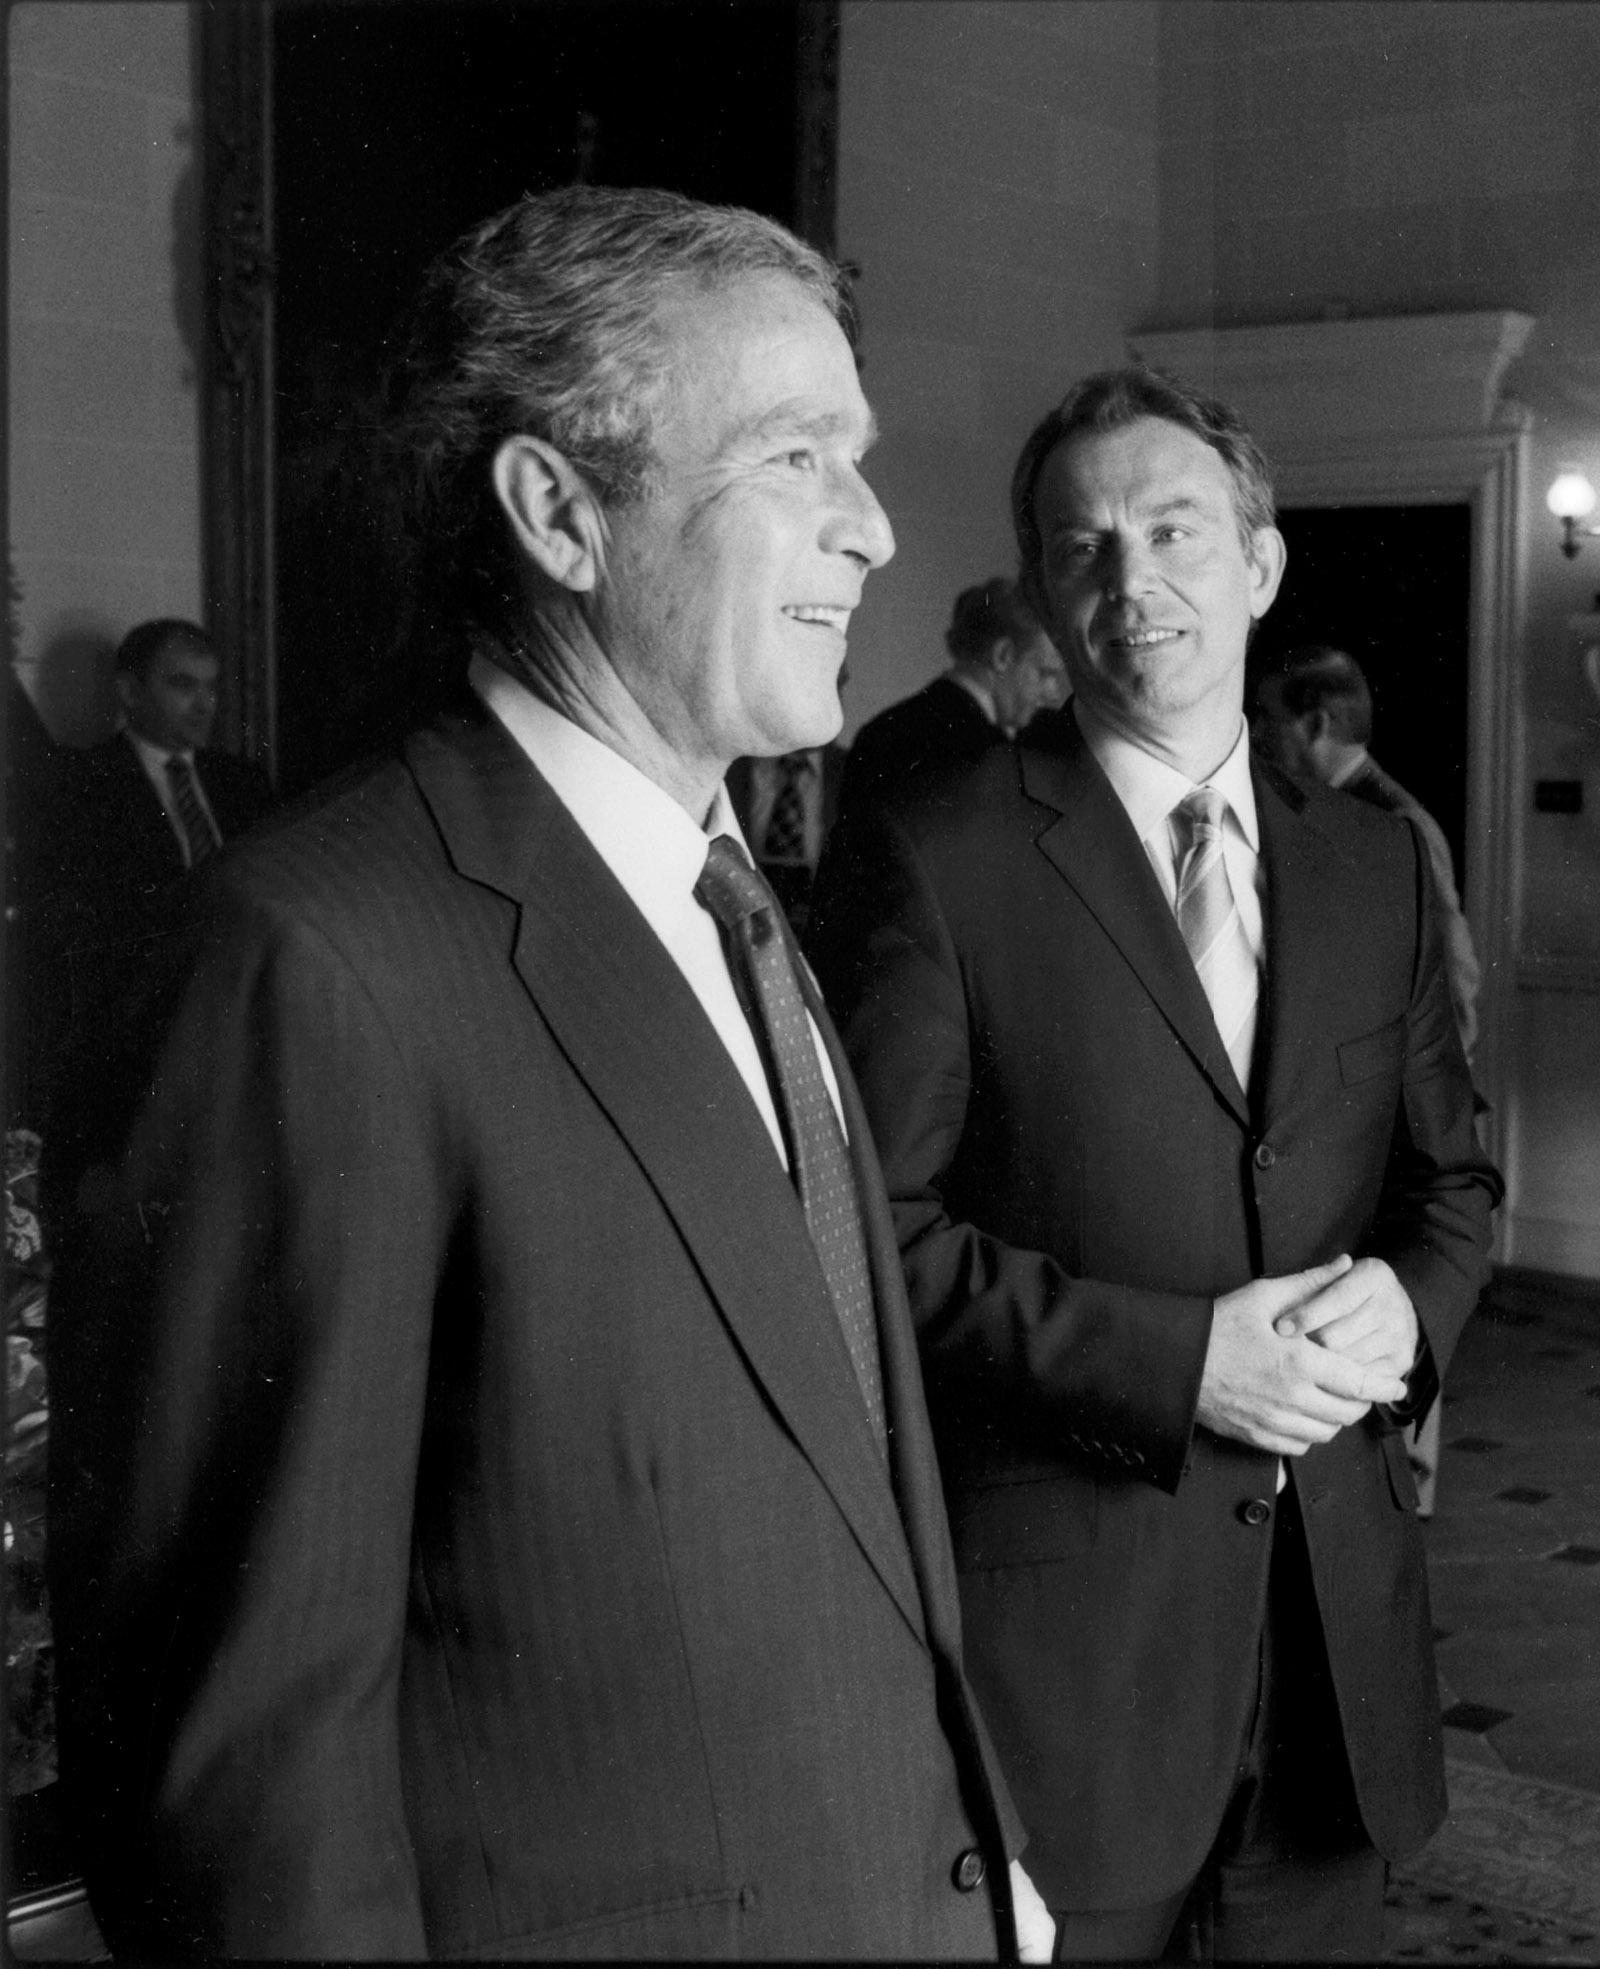 President Bush and Prime Minister Blair at Hillsborough Castle, April 2003